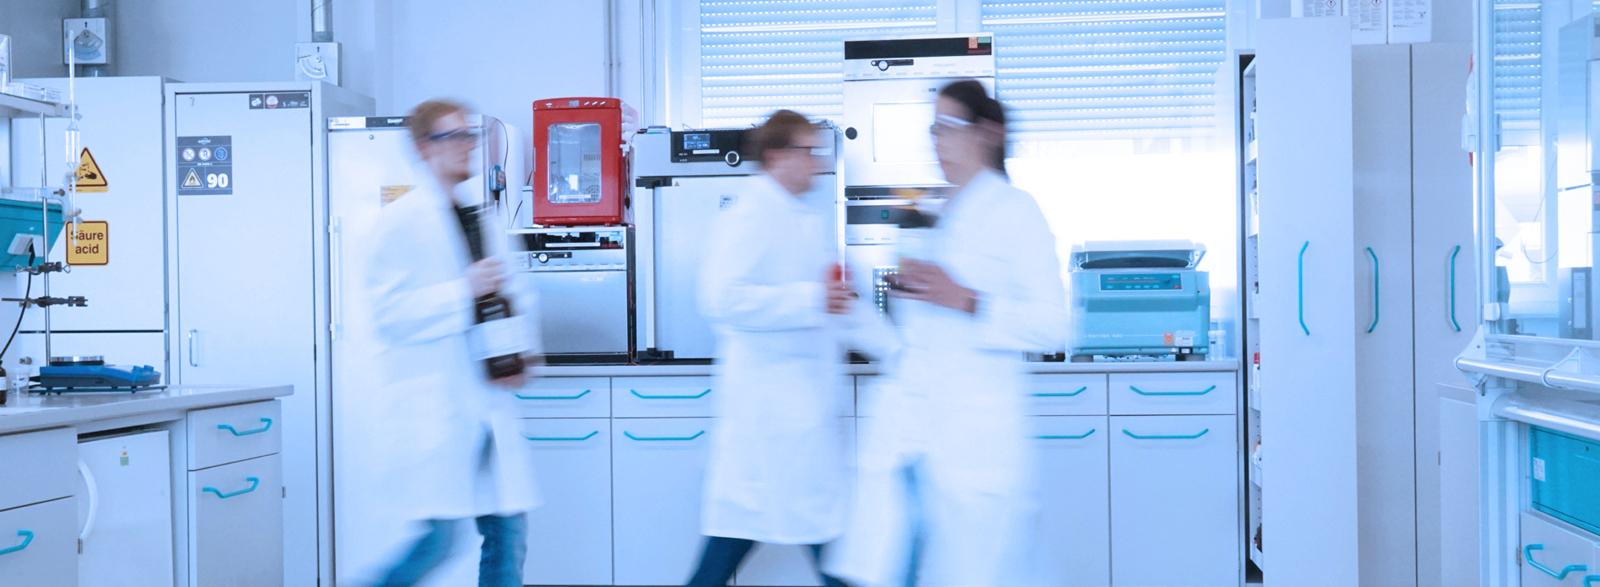 DSI-pharm analysis of pharmaceuticals